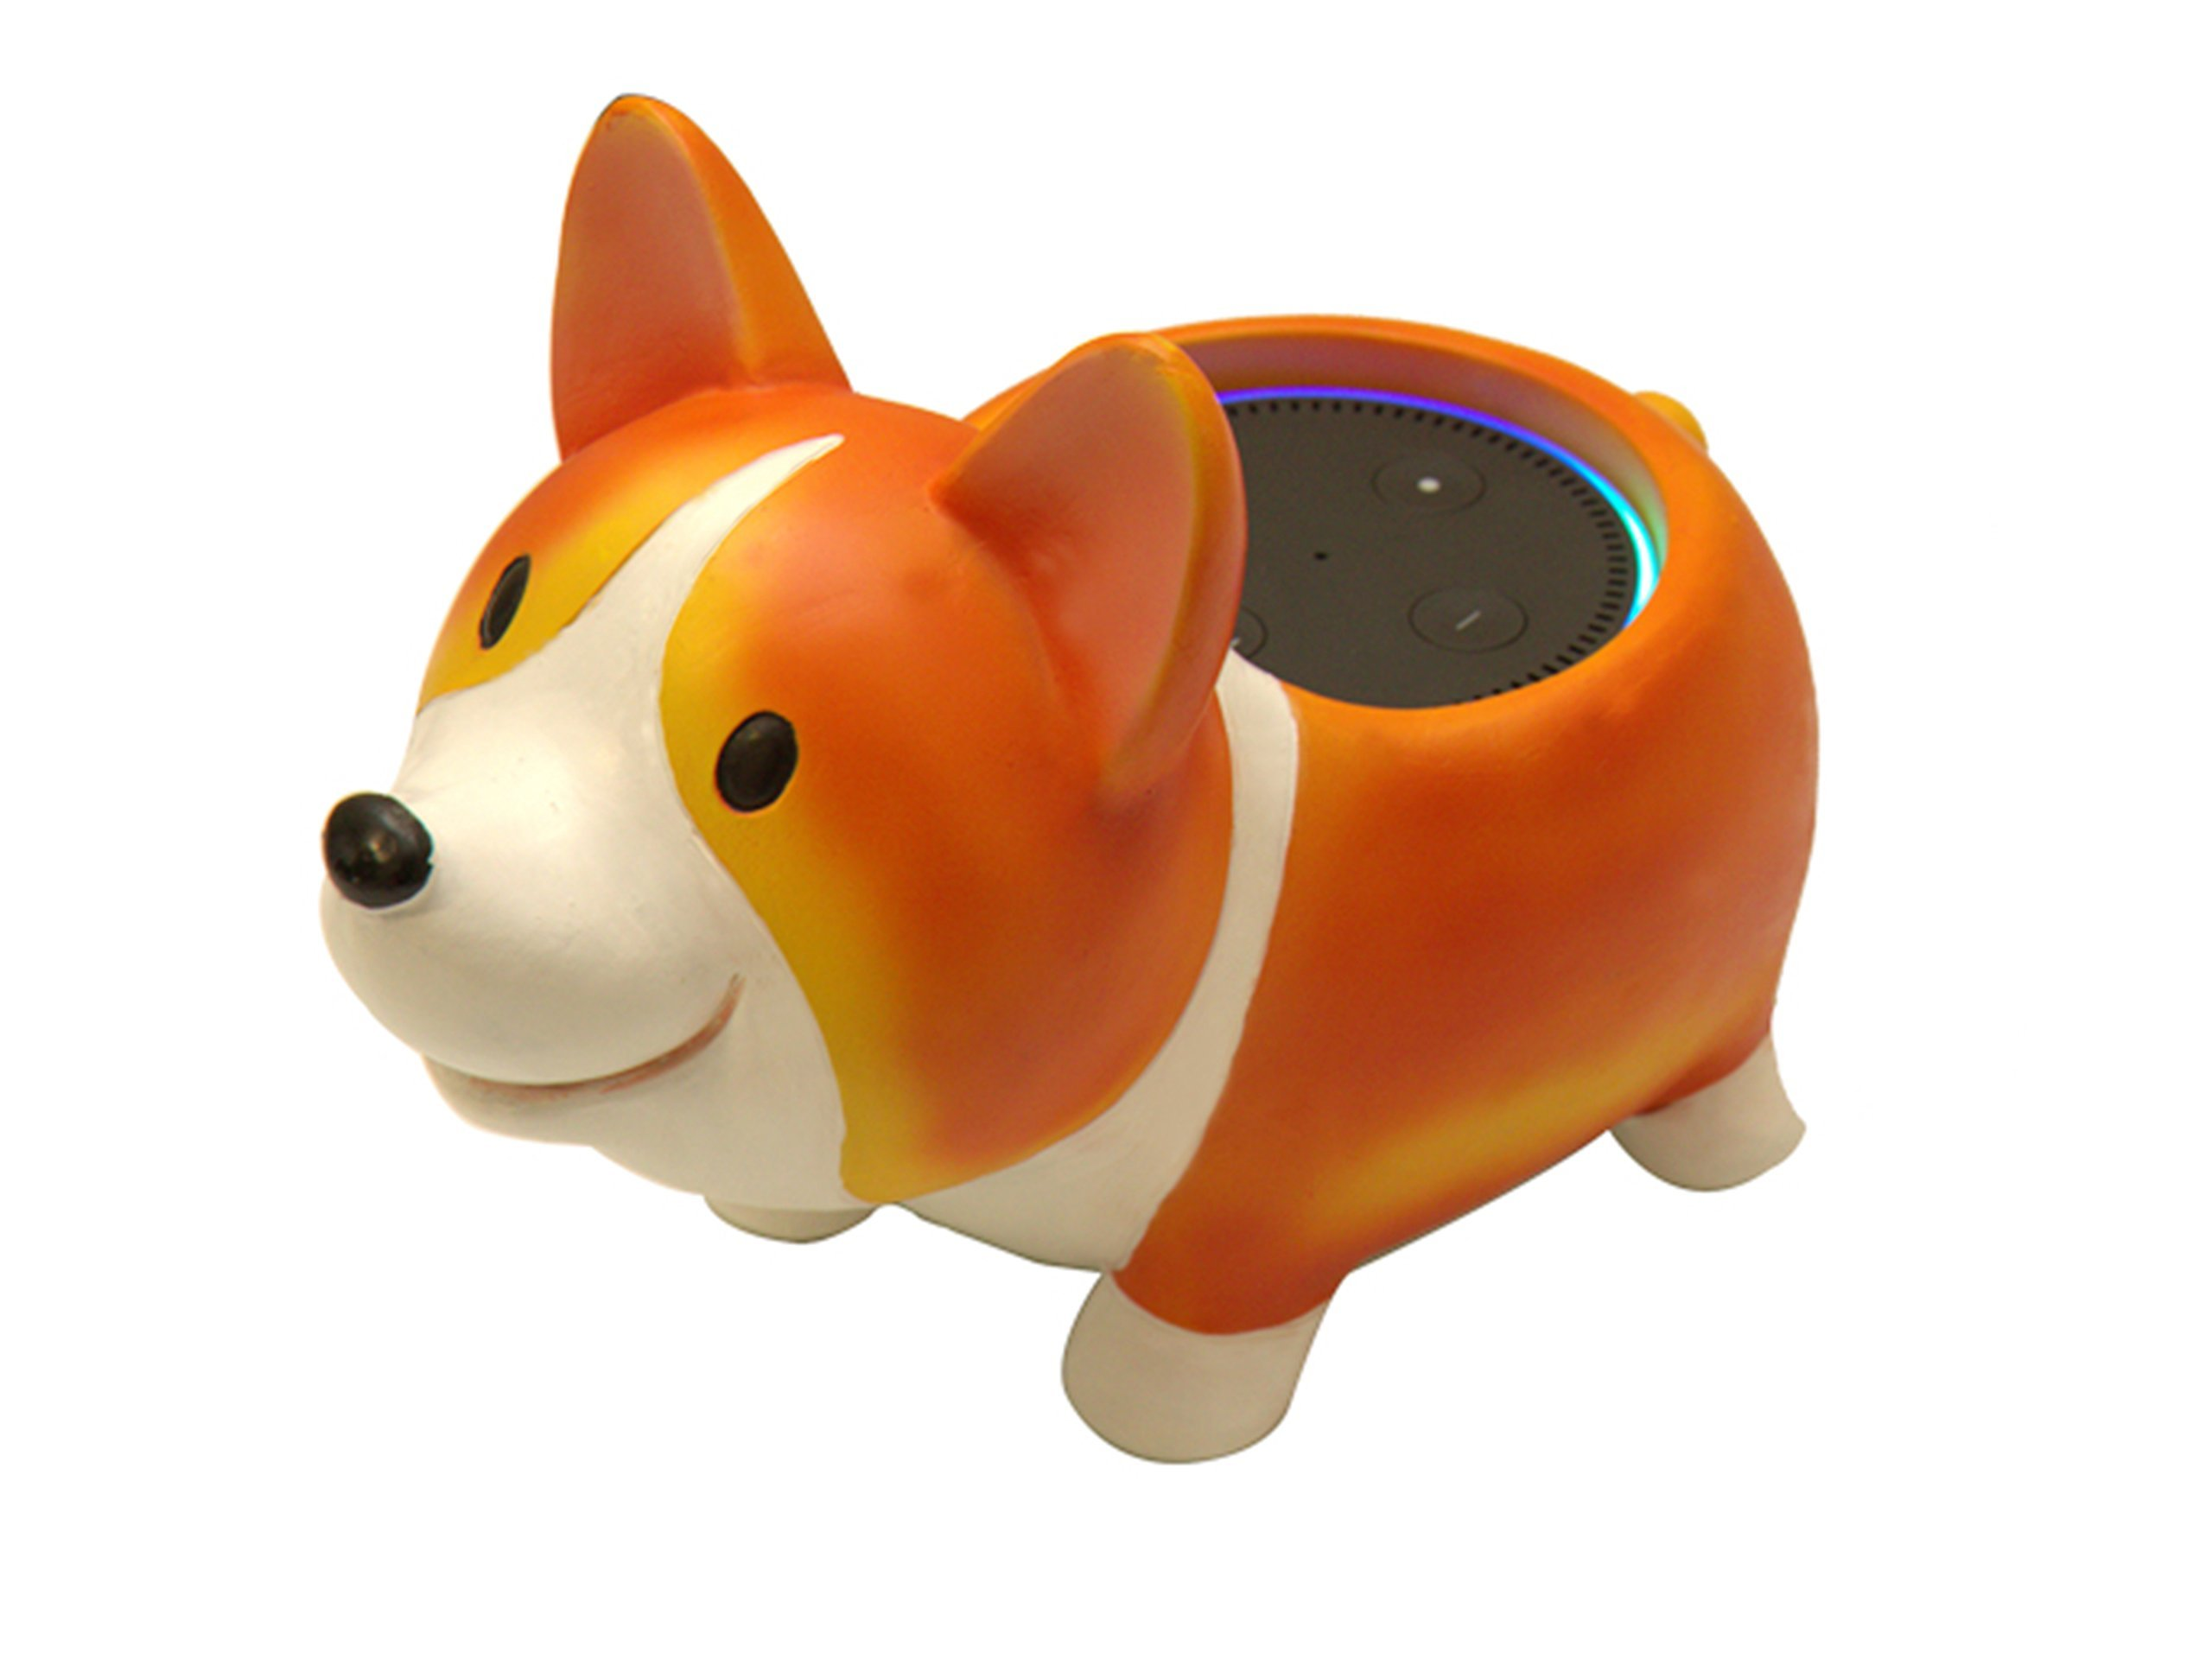 Corgi Dog Holder Stand Mount For Alexa Echo Dot, Bose, Anker, Home Mini round speakers Accessories